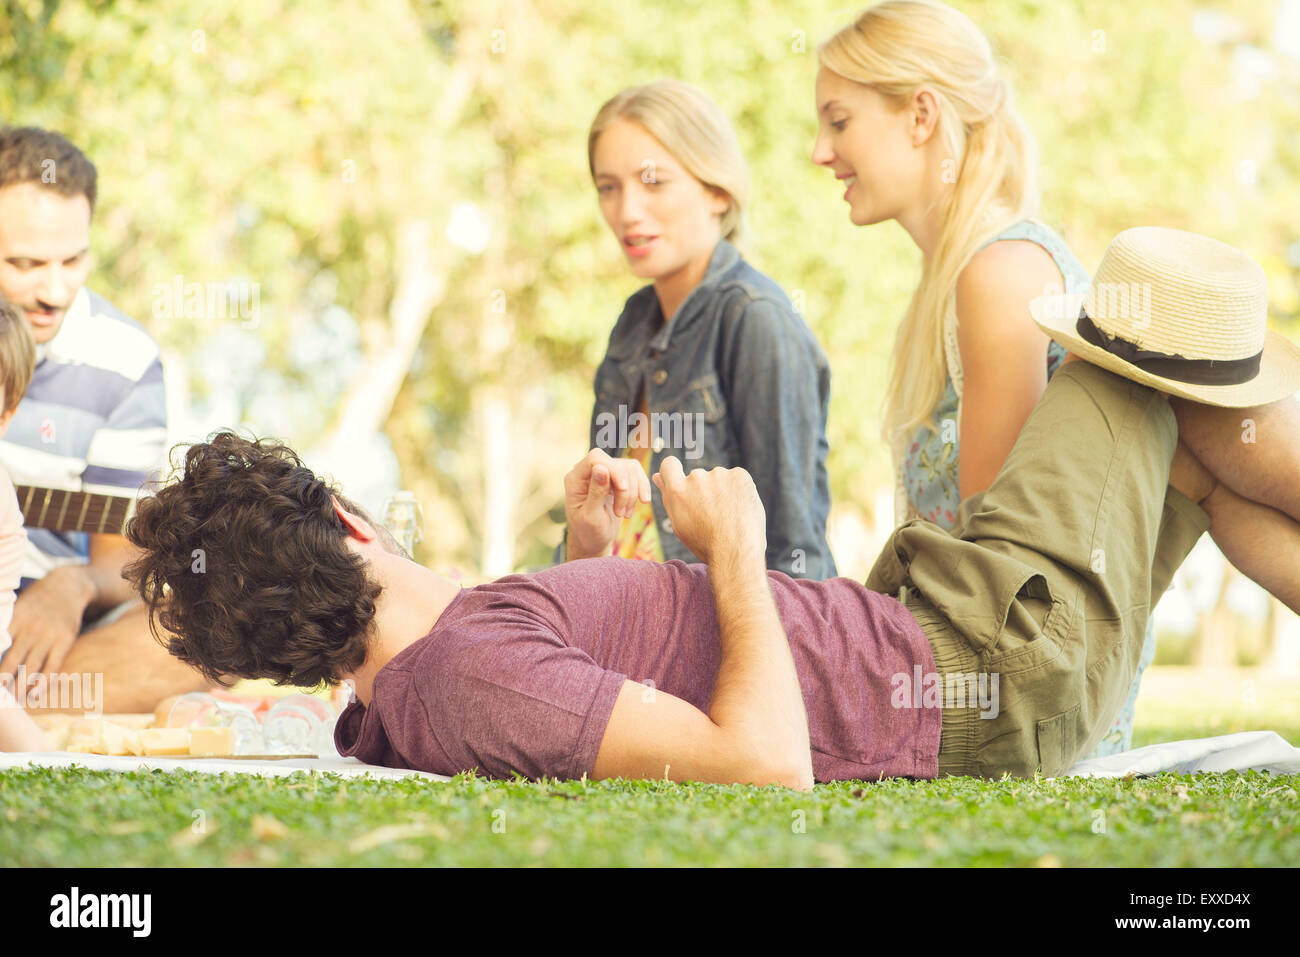 Mann am Picknick mit Freunden Stockbild